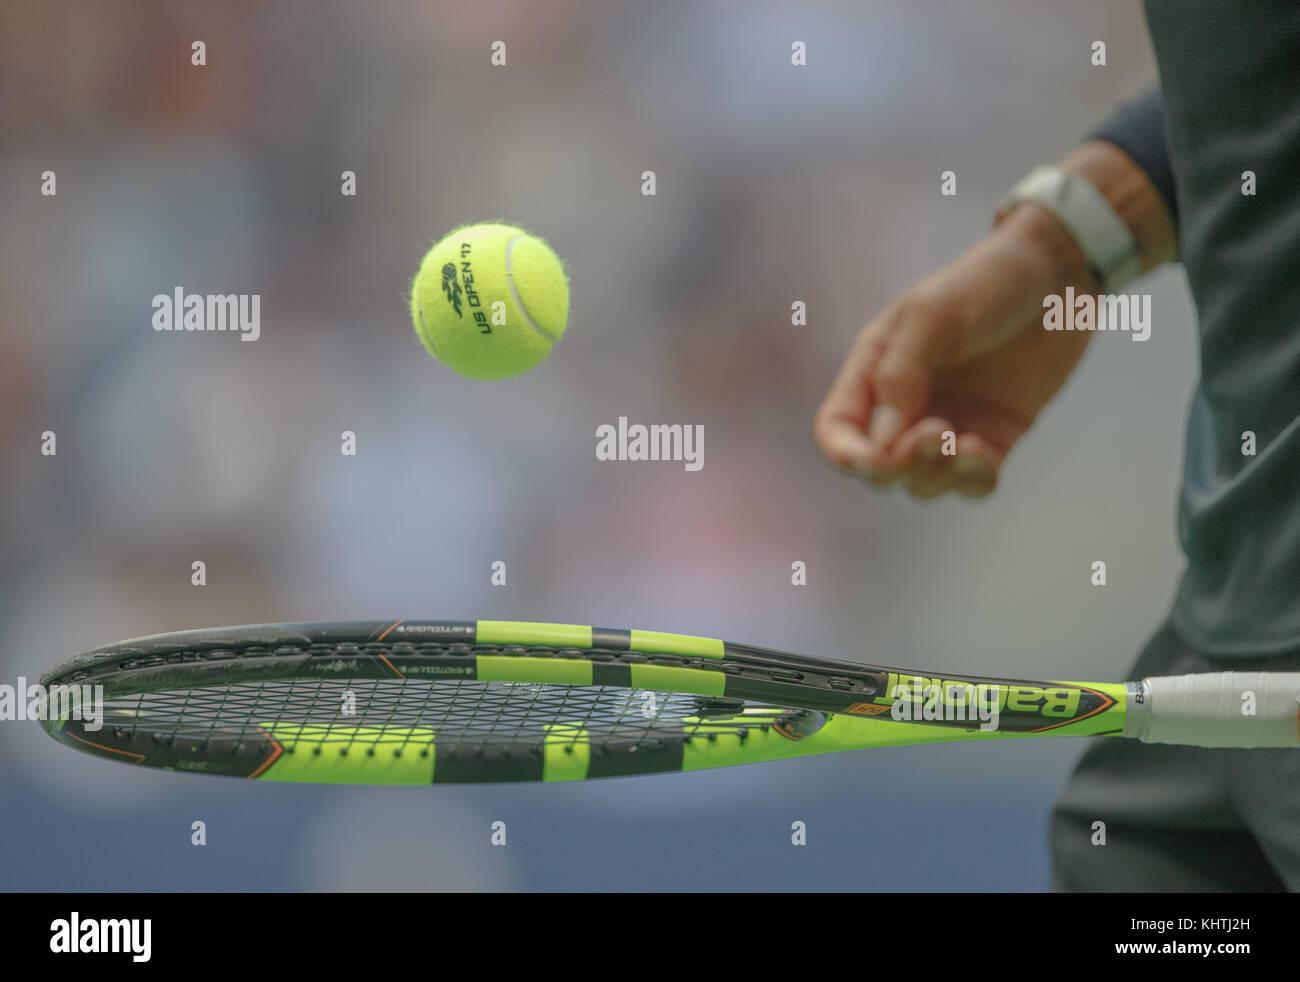 Spanish tennis player Rafael Nadal bouncing tennis ball on tennis racket in US Open 2017 Tennis Championship, New - Stock Image